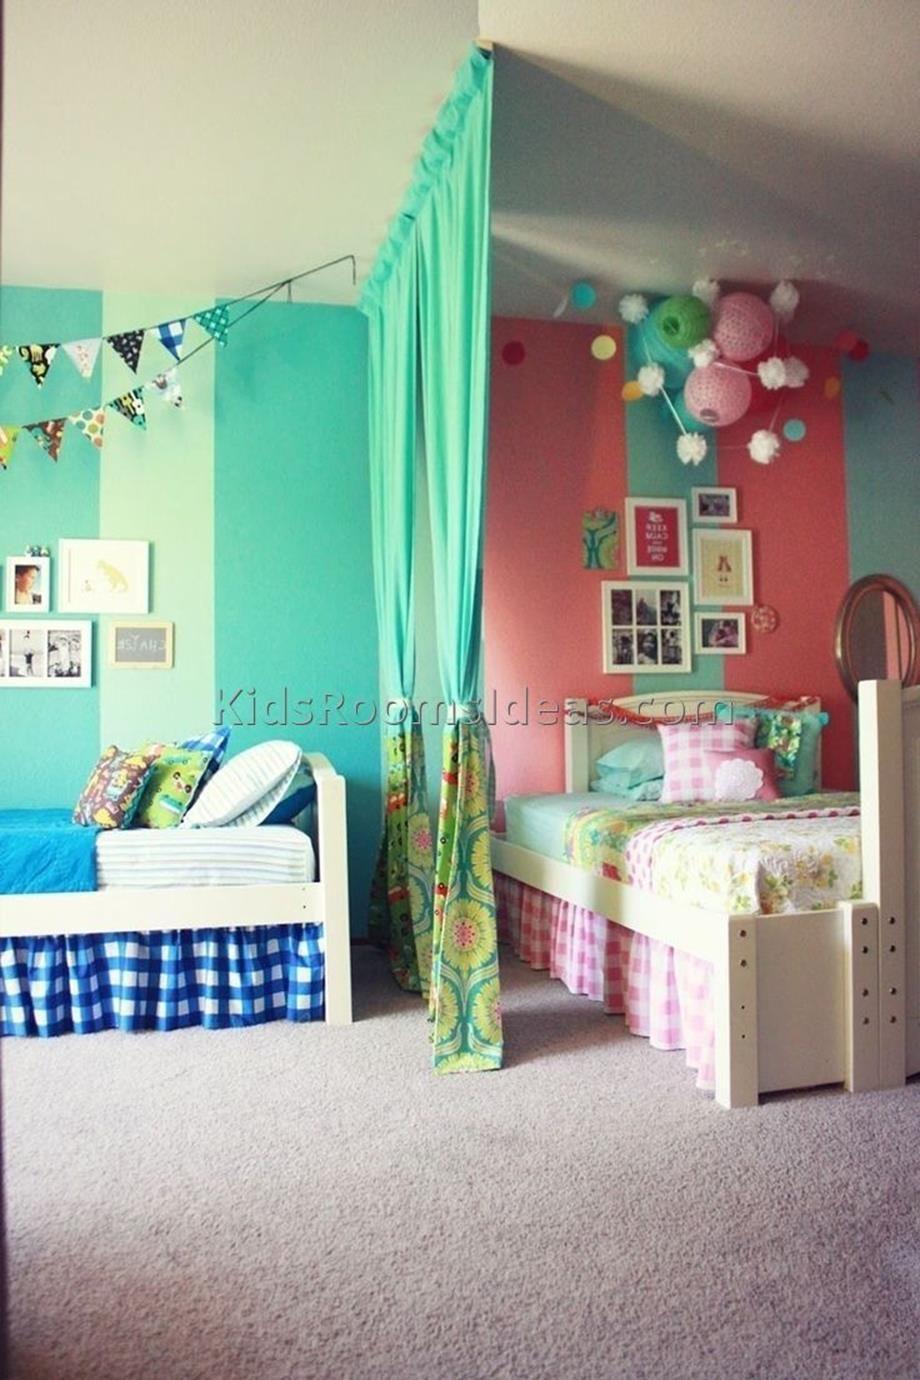 Room Dividers For Kids Bedrooms 19 Viral Decoration Ikea Divider Boy And Girl Shared Bedroom